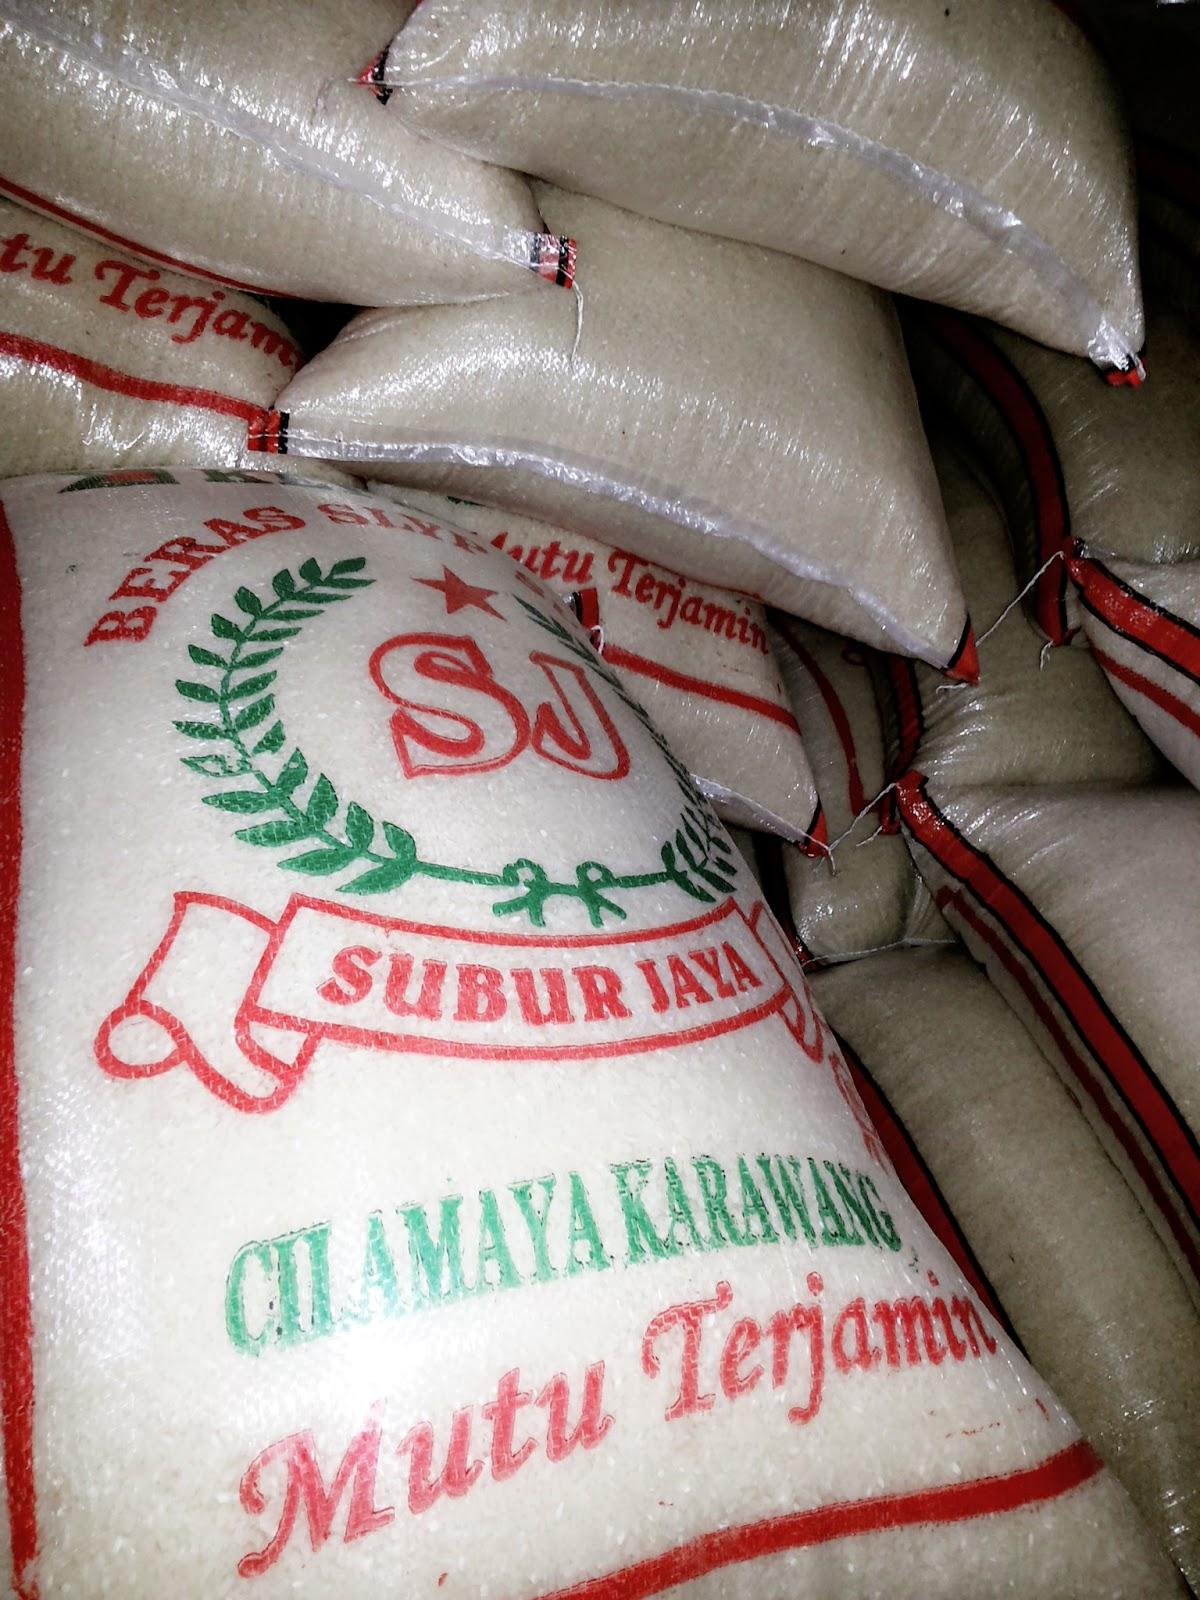 Toko Alex Sport Jual Beras Murah Agen Beras Supplier